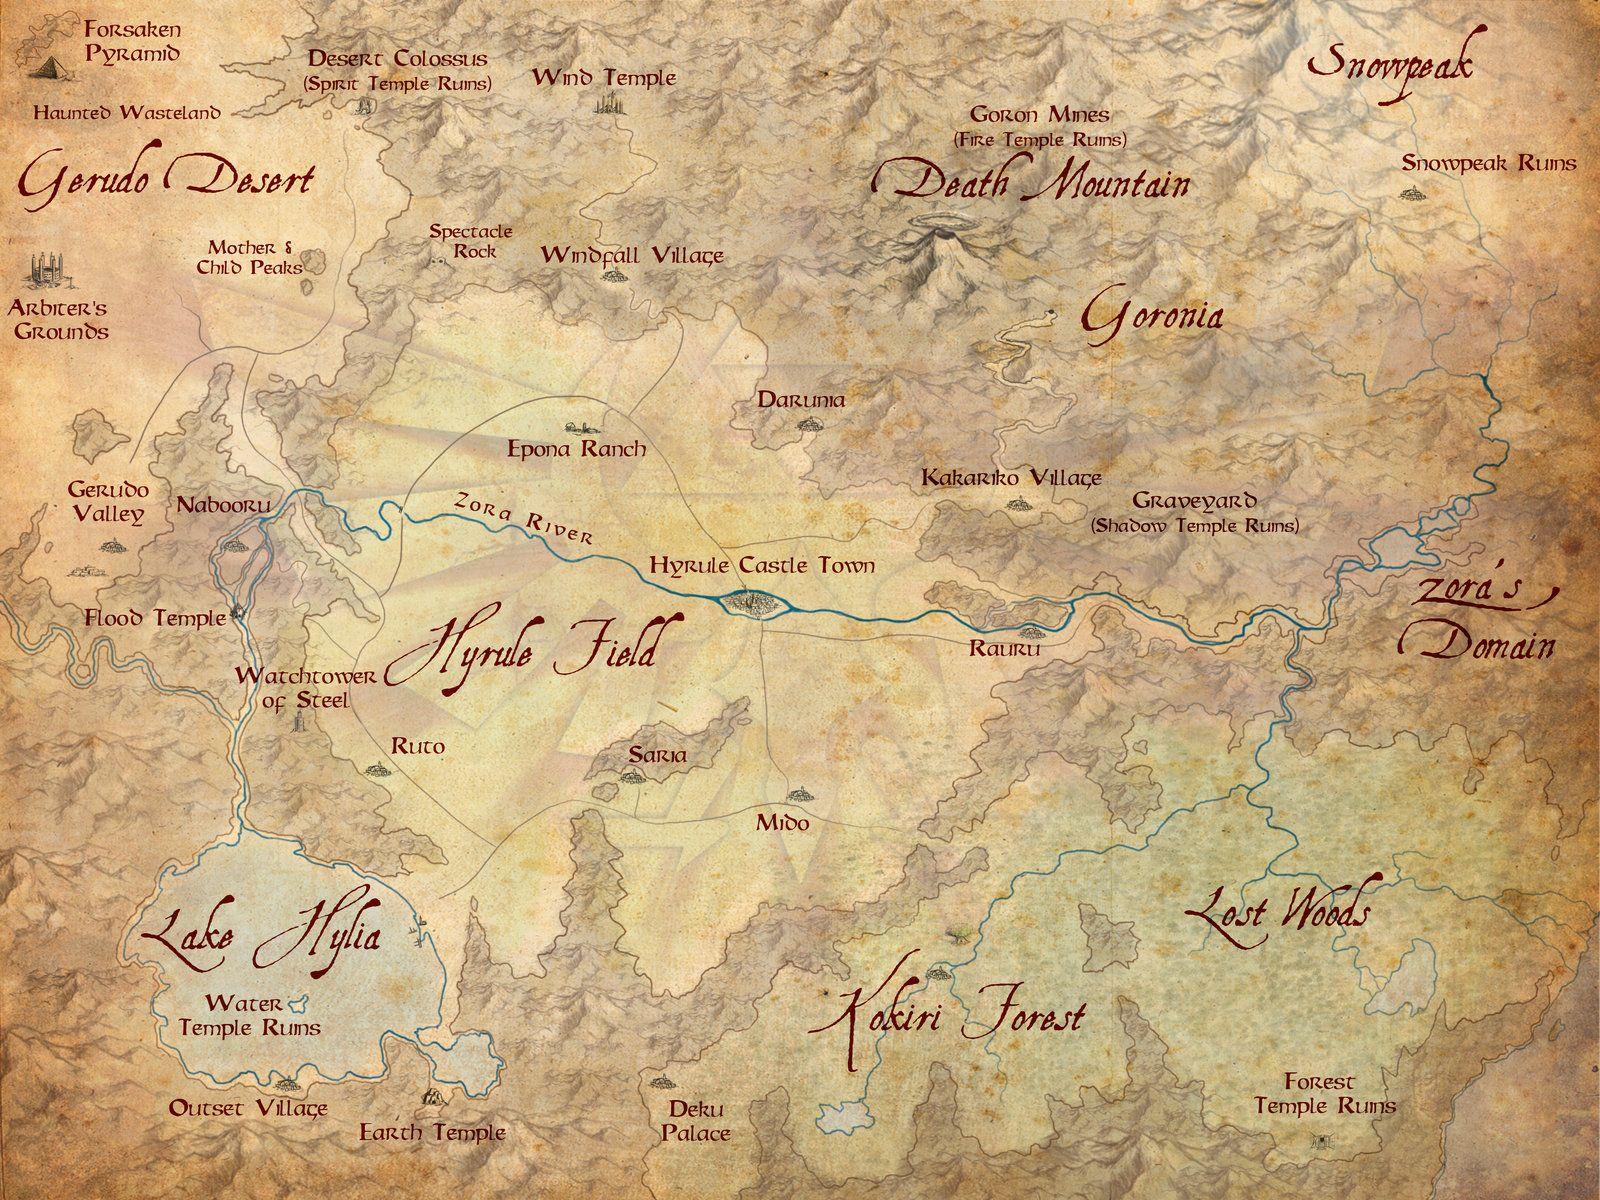 Hyrule Map The Dark Deluge By Mattleese87 On Deviantart